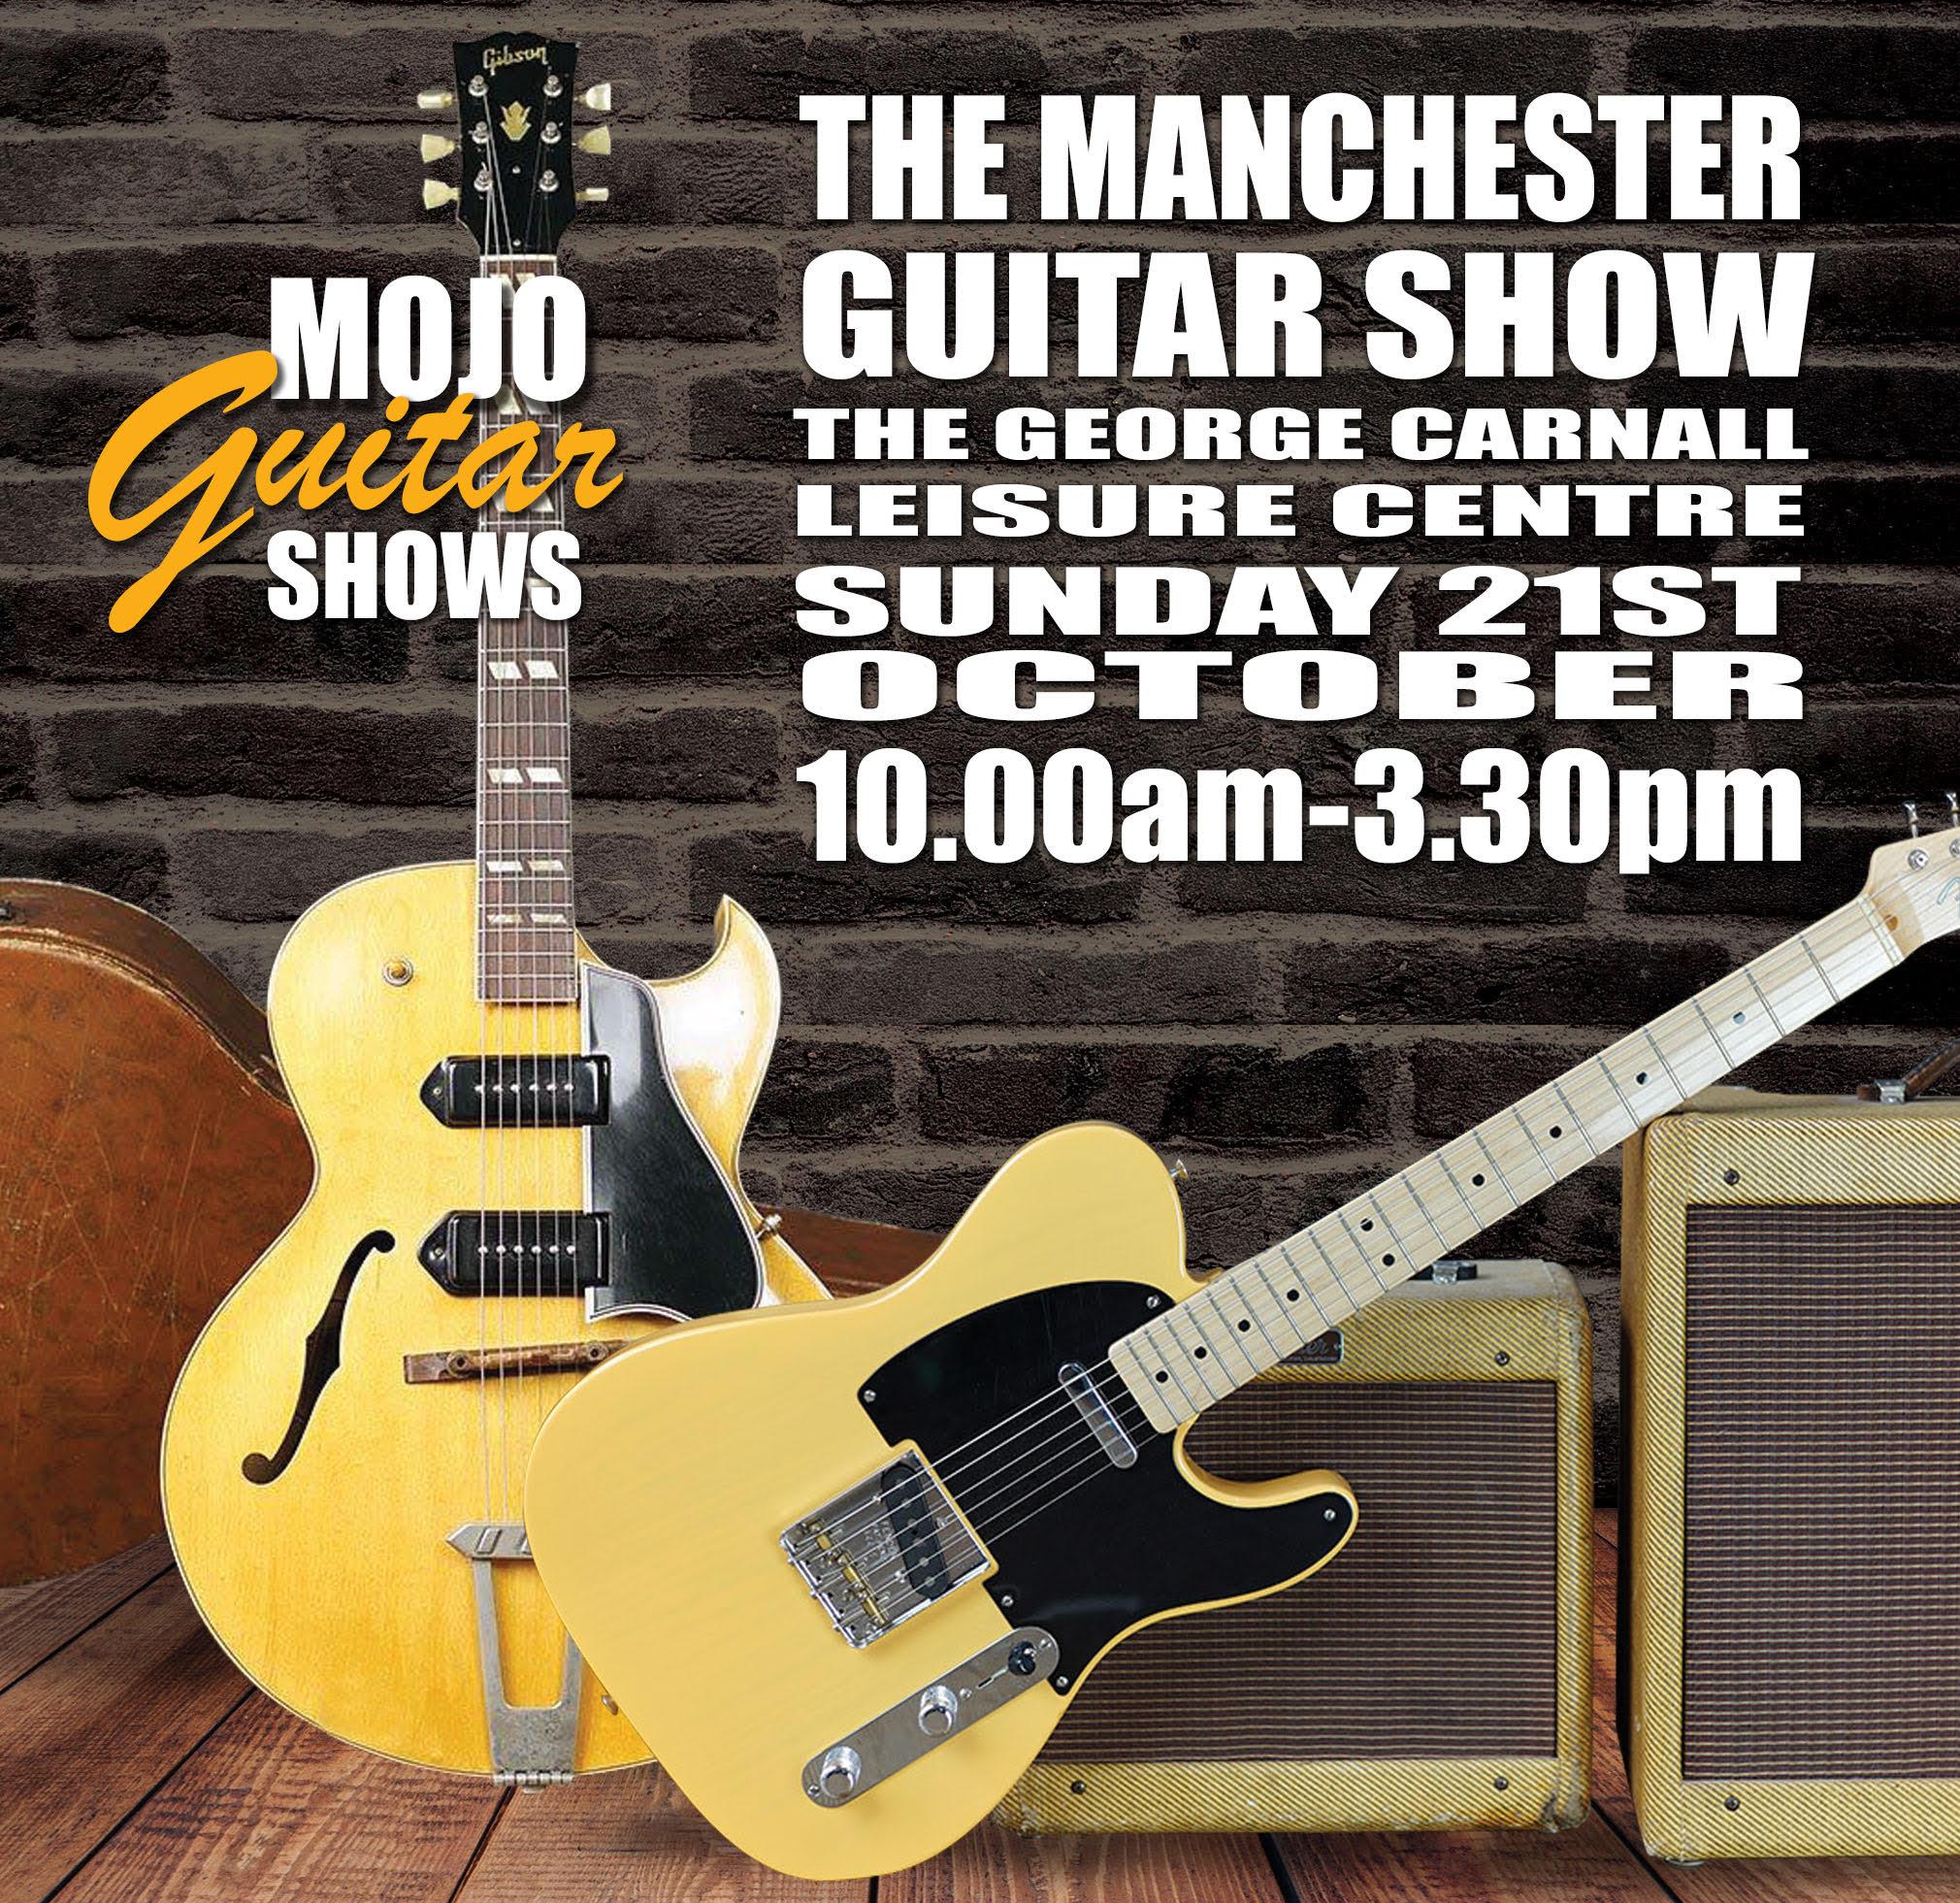 Press Release: Manchester Guitar Show returns for 2018